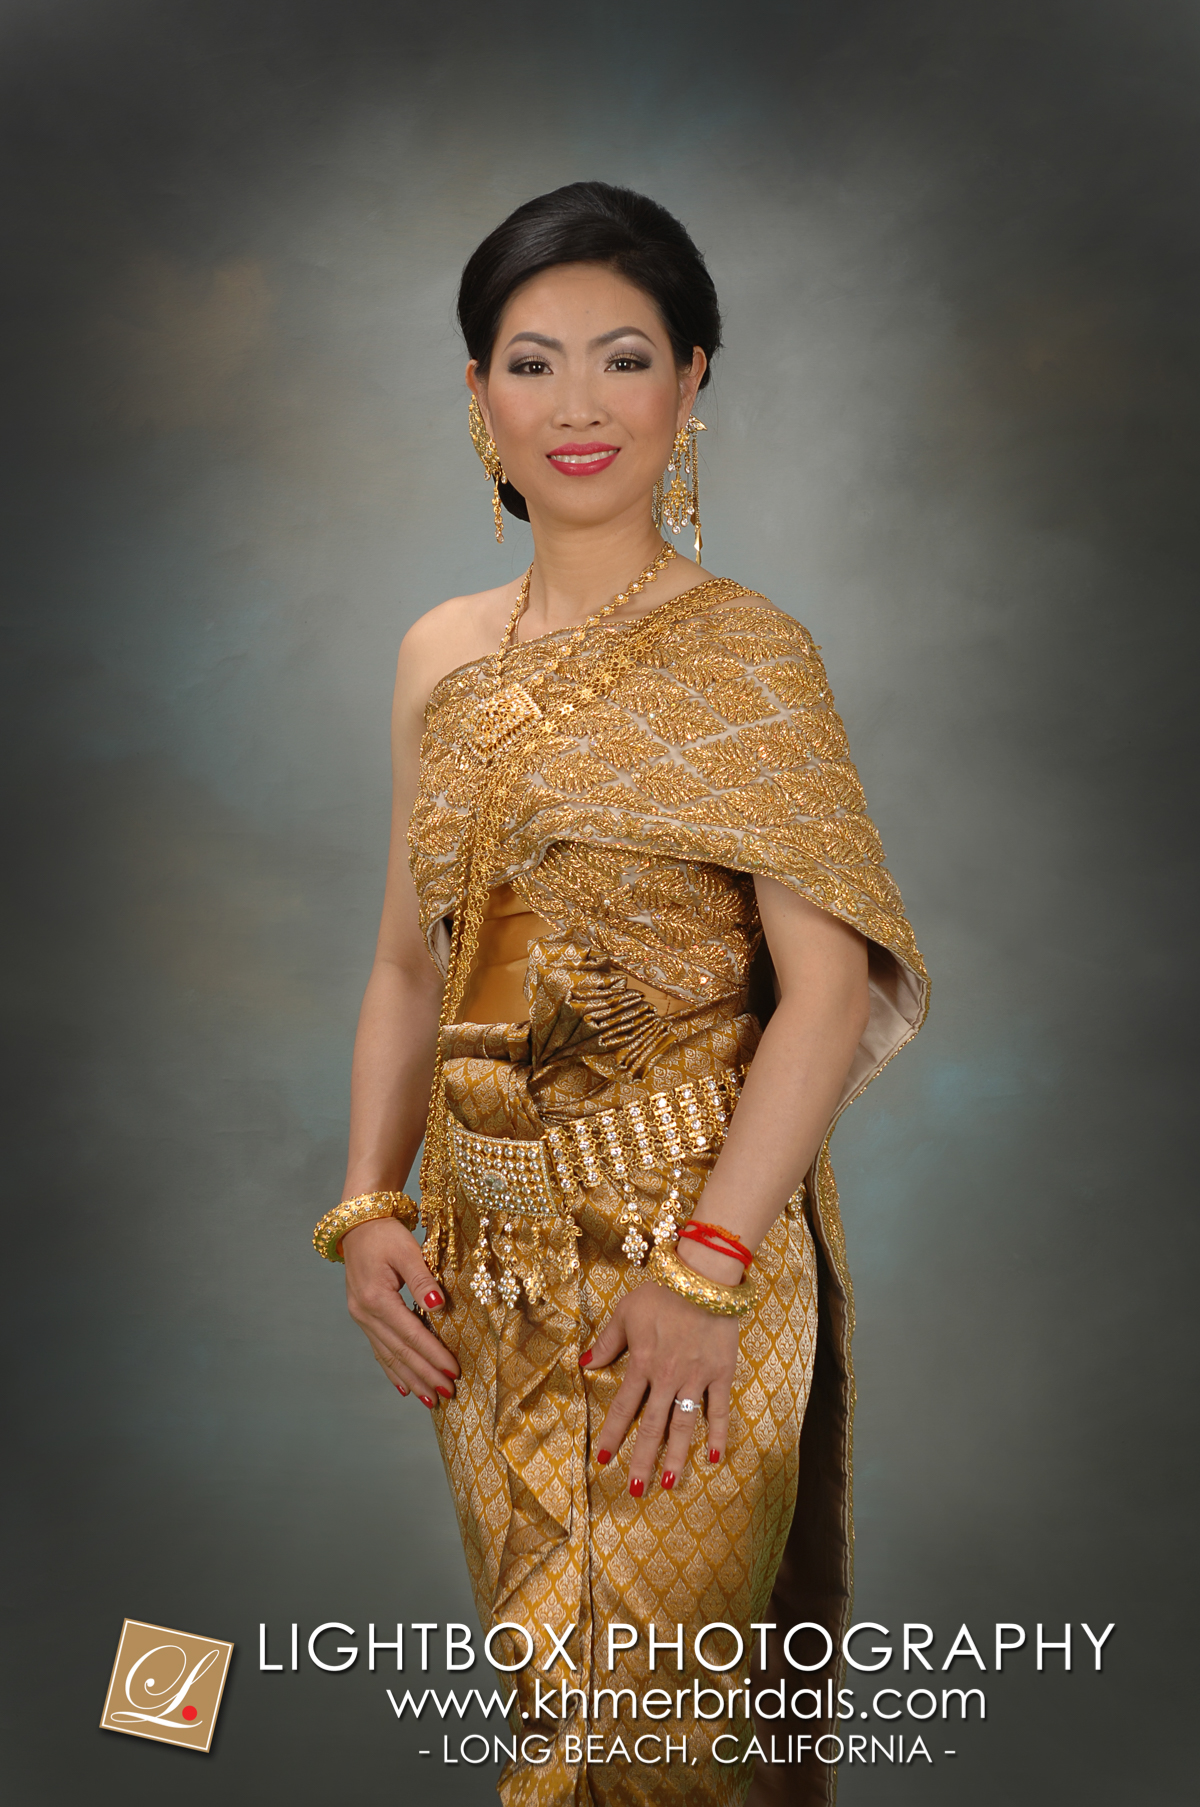 Apsara Khmer Bridal Wedding Photography and video-215.jpg